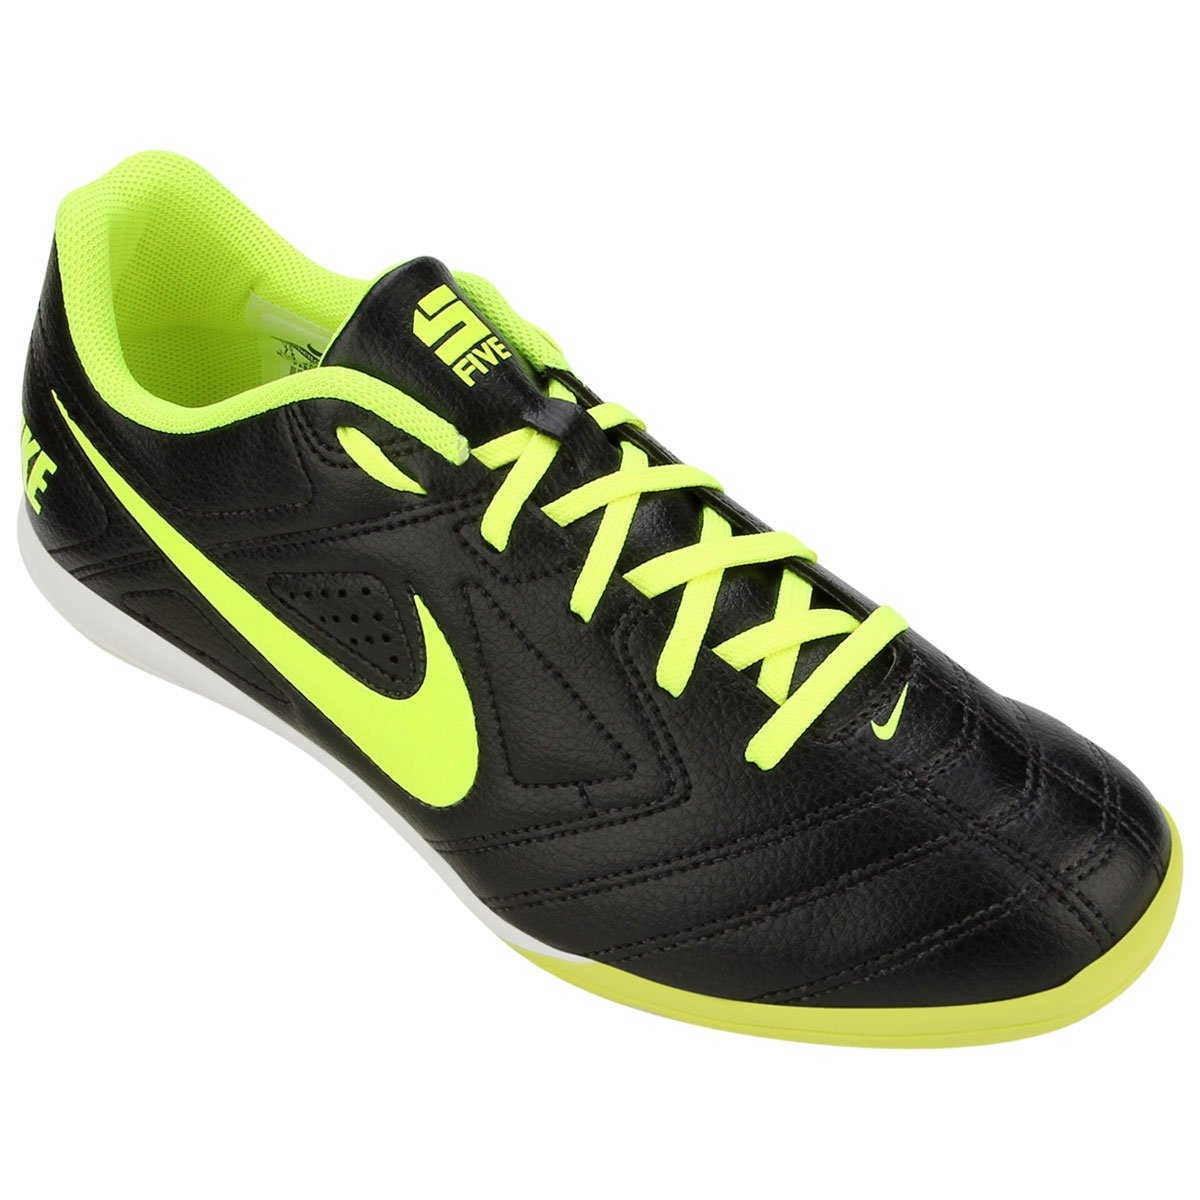 fbb0c17eaa Chuteira Nike 5 Beco - Compre Agora